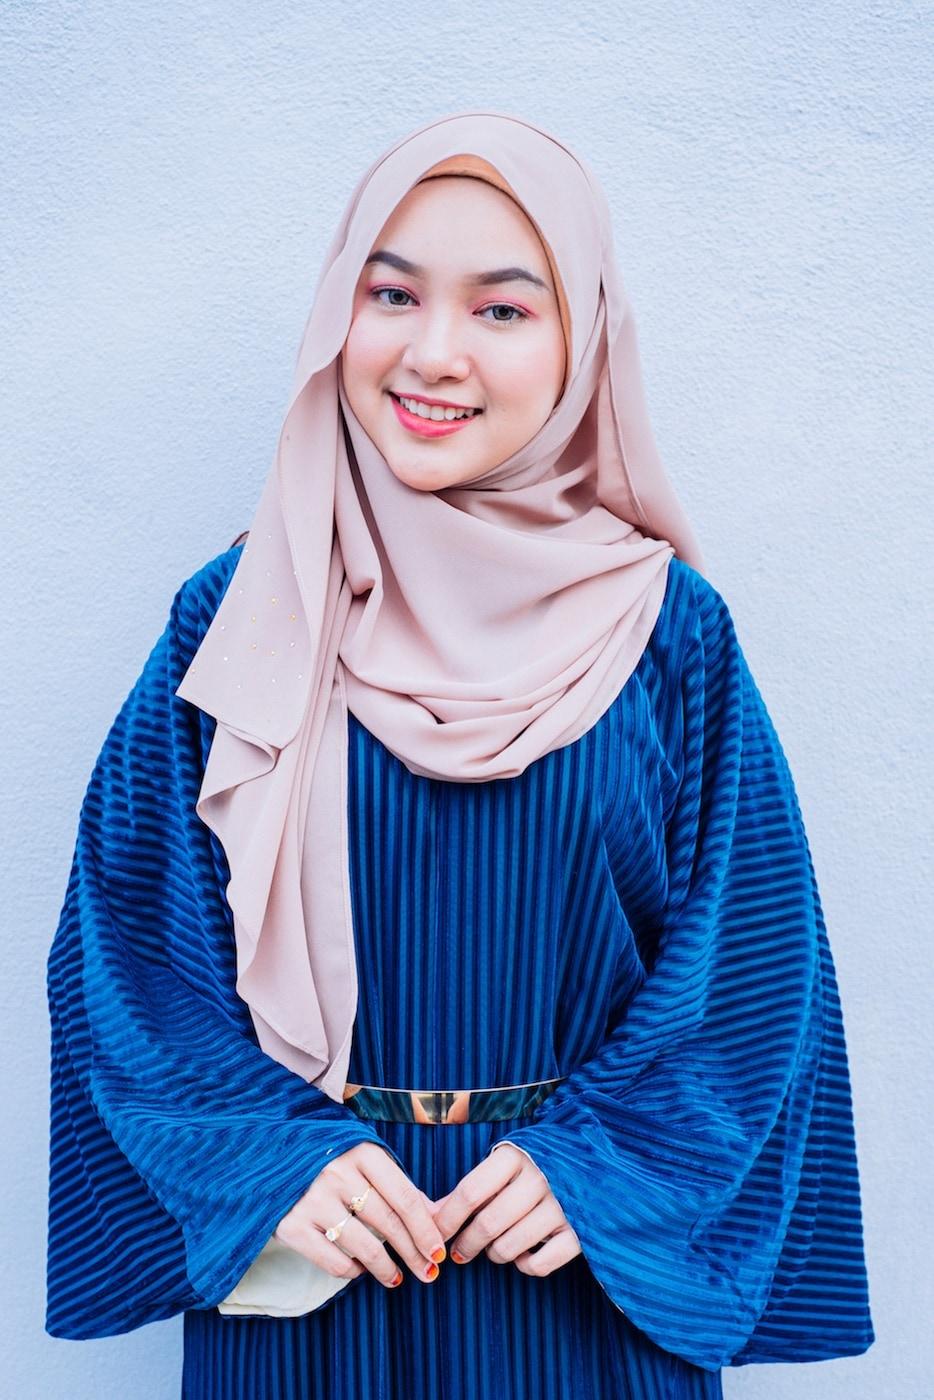 Mipster dengan warna hijab dusty pink dan warna baju biru